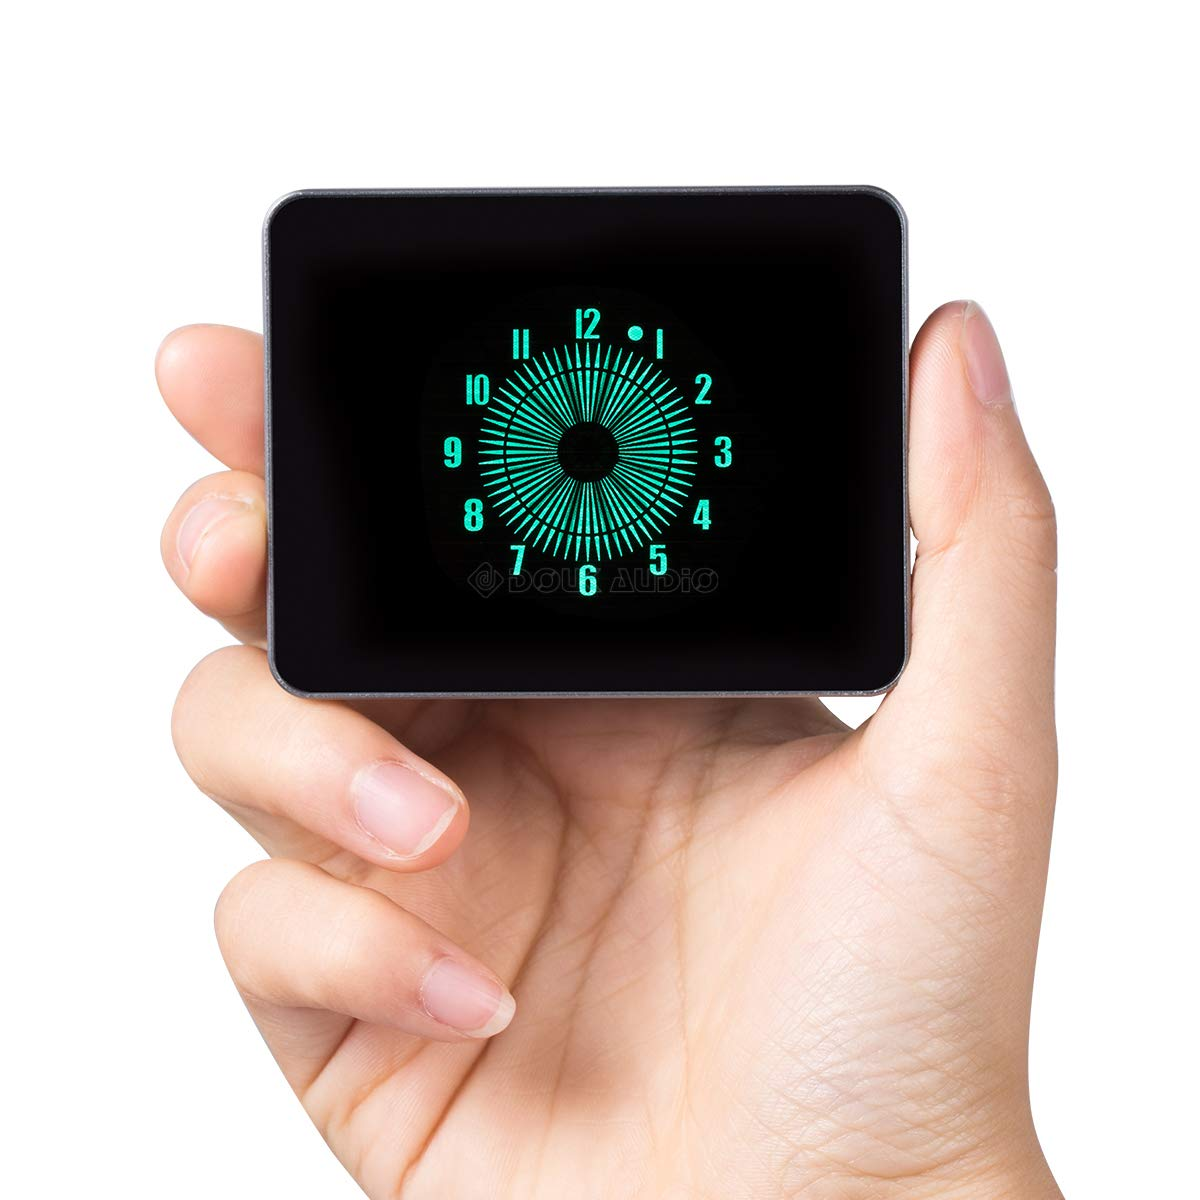 Amazon.com: Douk Audio Nobsound VFD Clock Pointer Clock Nixie Tube ERA Aluminum Case USB Powered Analog-Style: Home & Kitchen